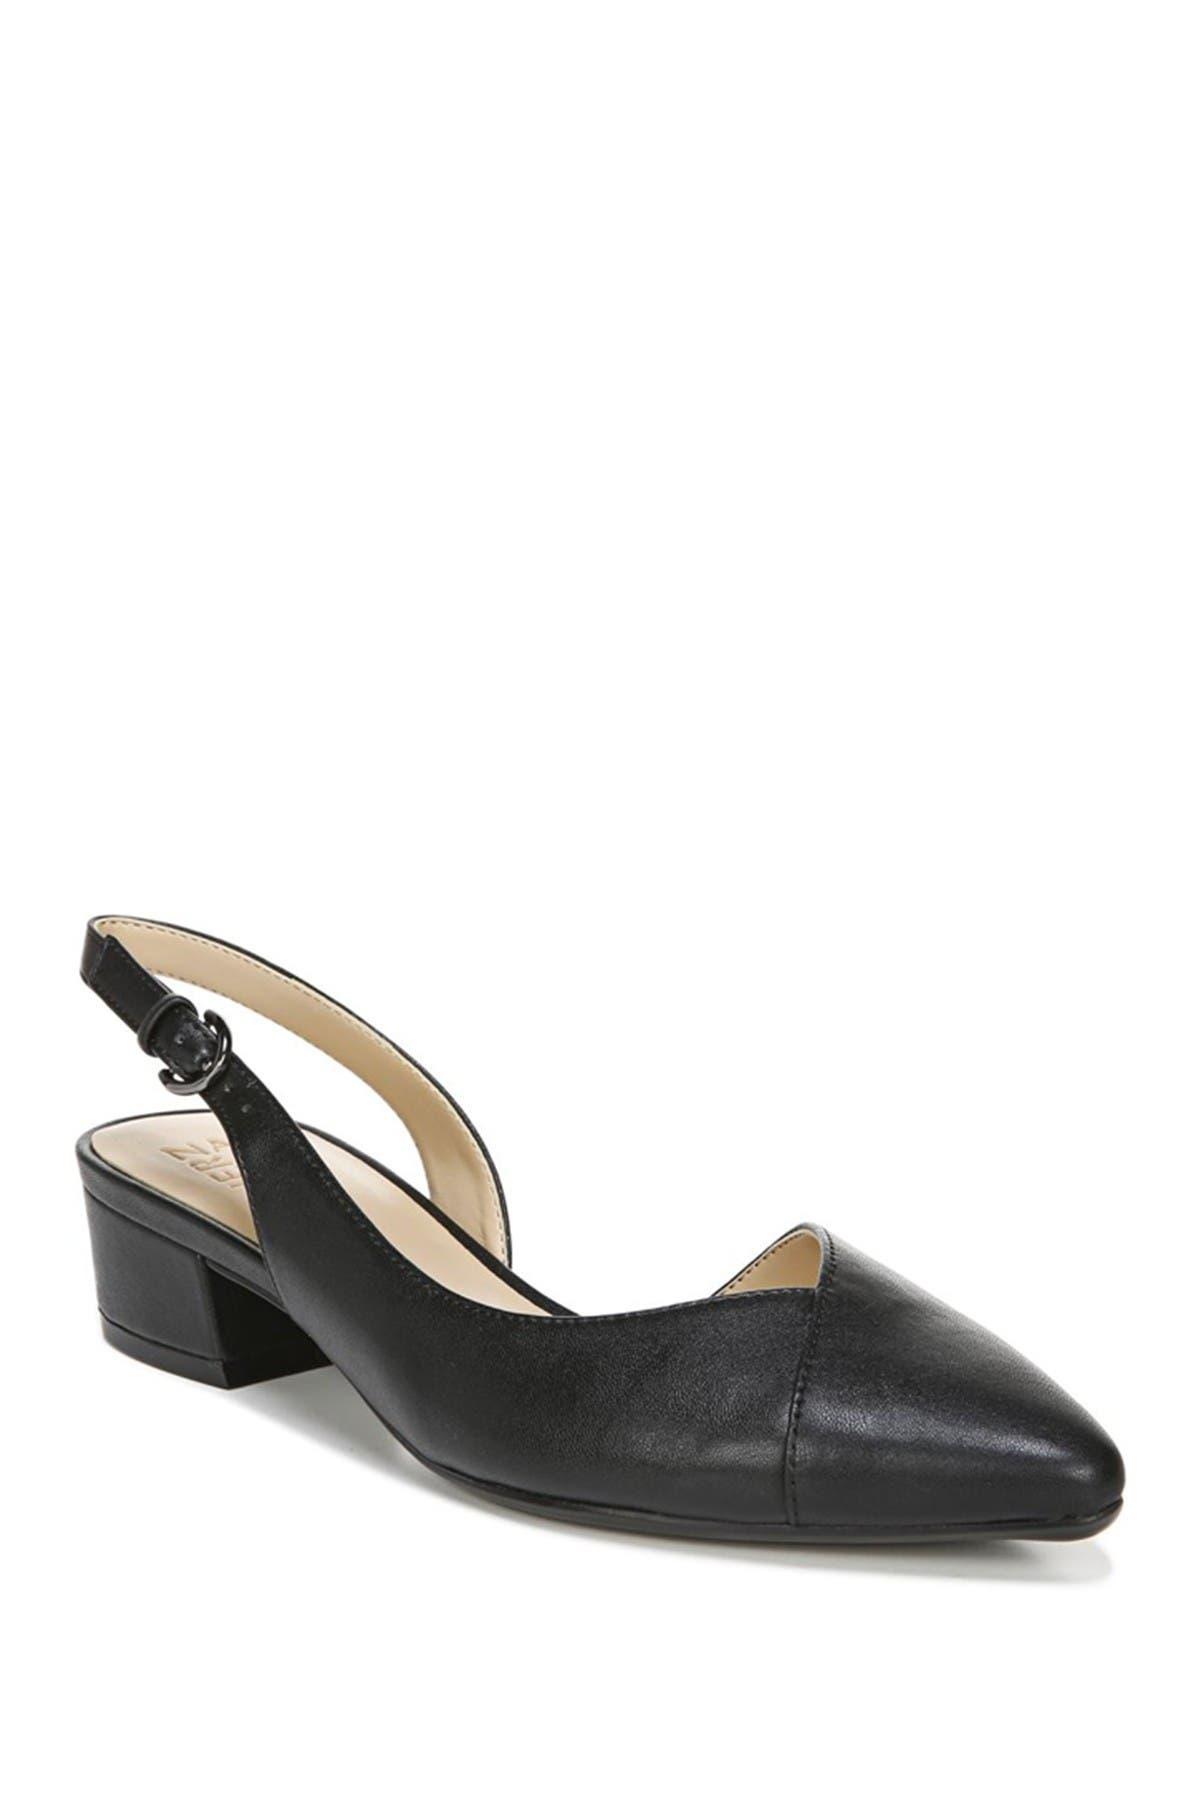 Image of Naturalizer Frisco Pointed Toe Block Heel